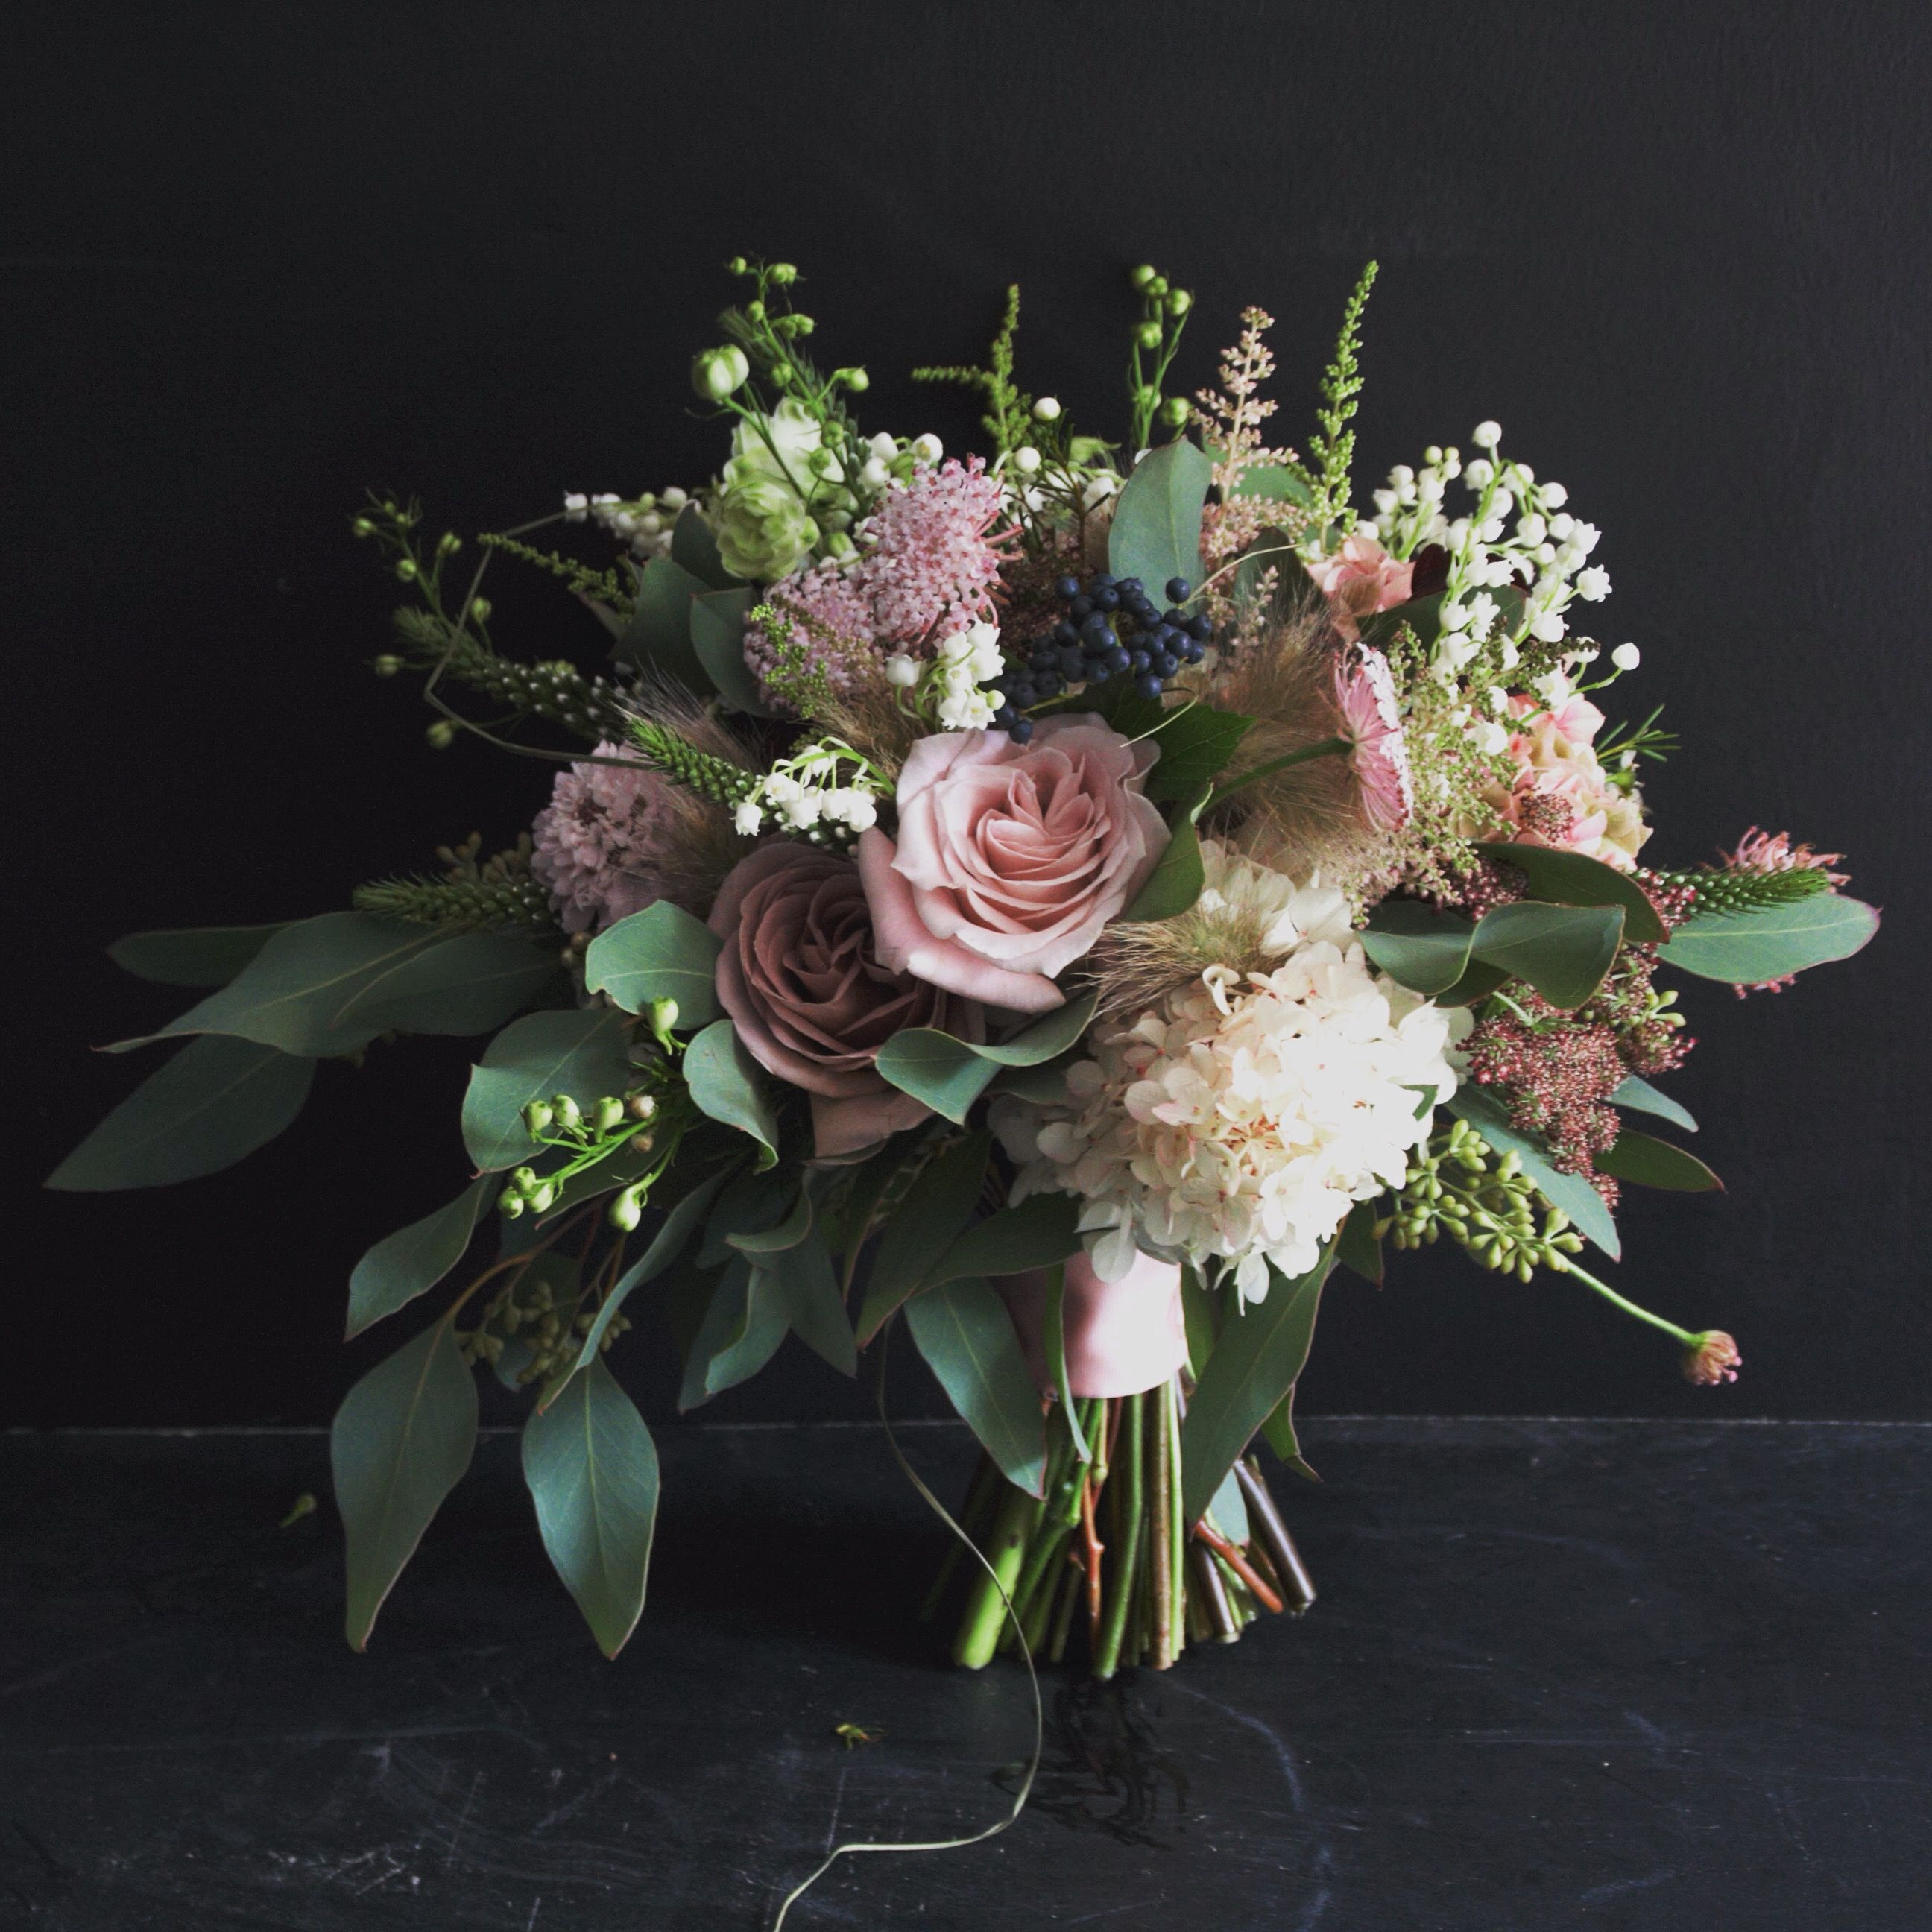 Wedding Hand Bouquet Flower: Hand Tied Wedding Bouquet Featuring: Pink/Blush Roses